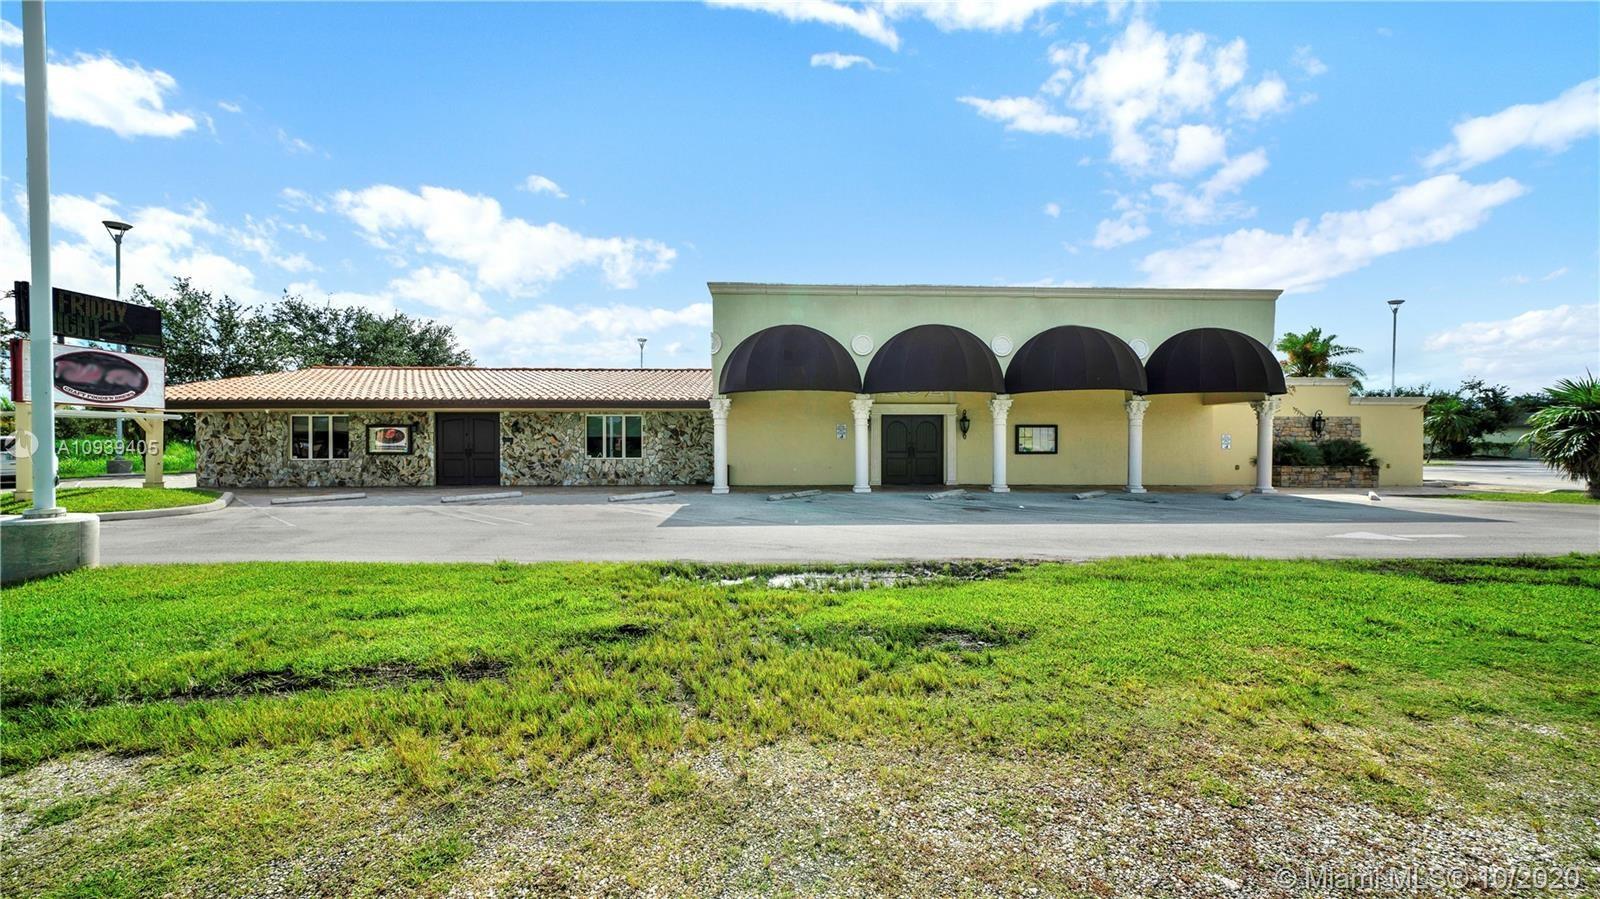 935 N Krome Ave, Florida City, FL 33030